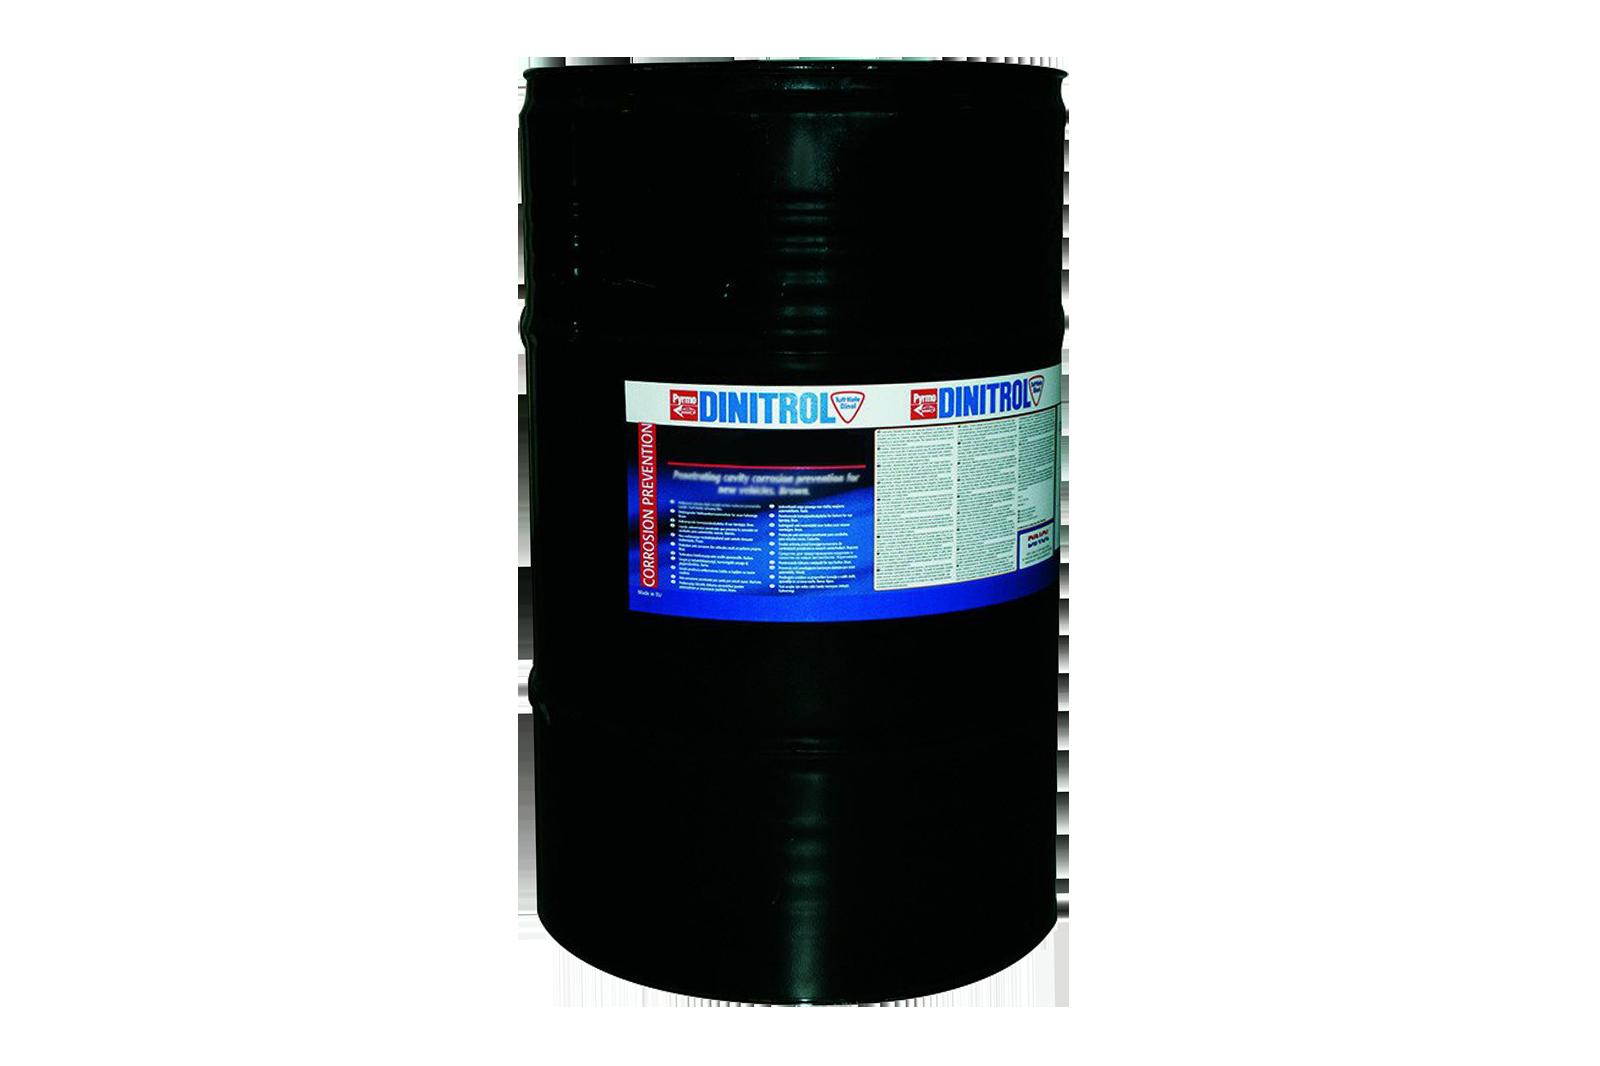 Afbeelding van Dinitrol 1000 penetrant 60 ltr, transparant, drum